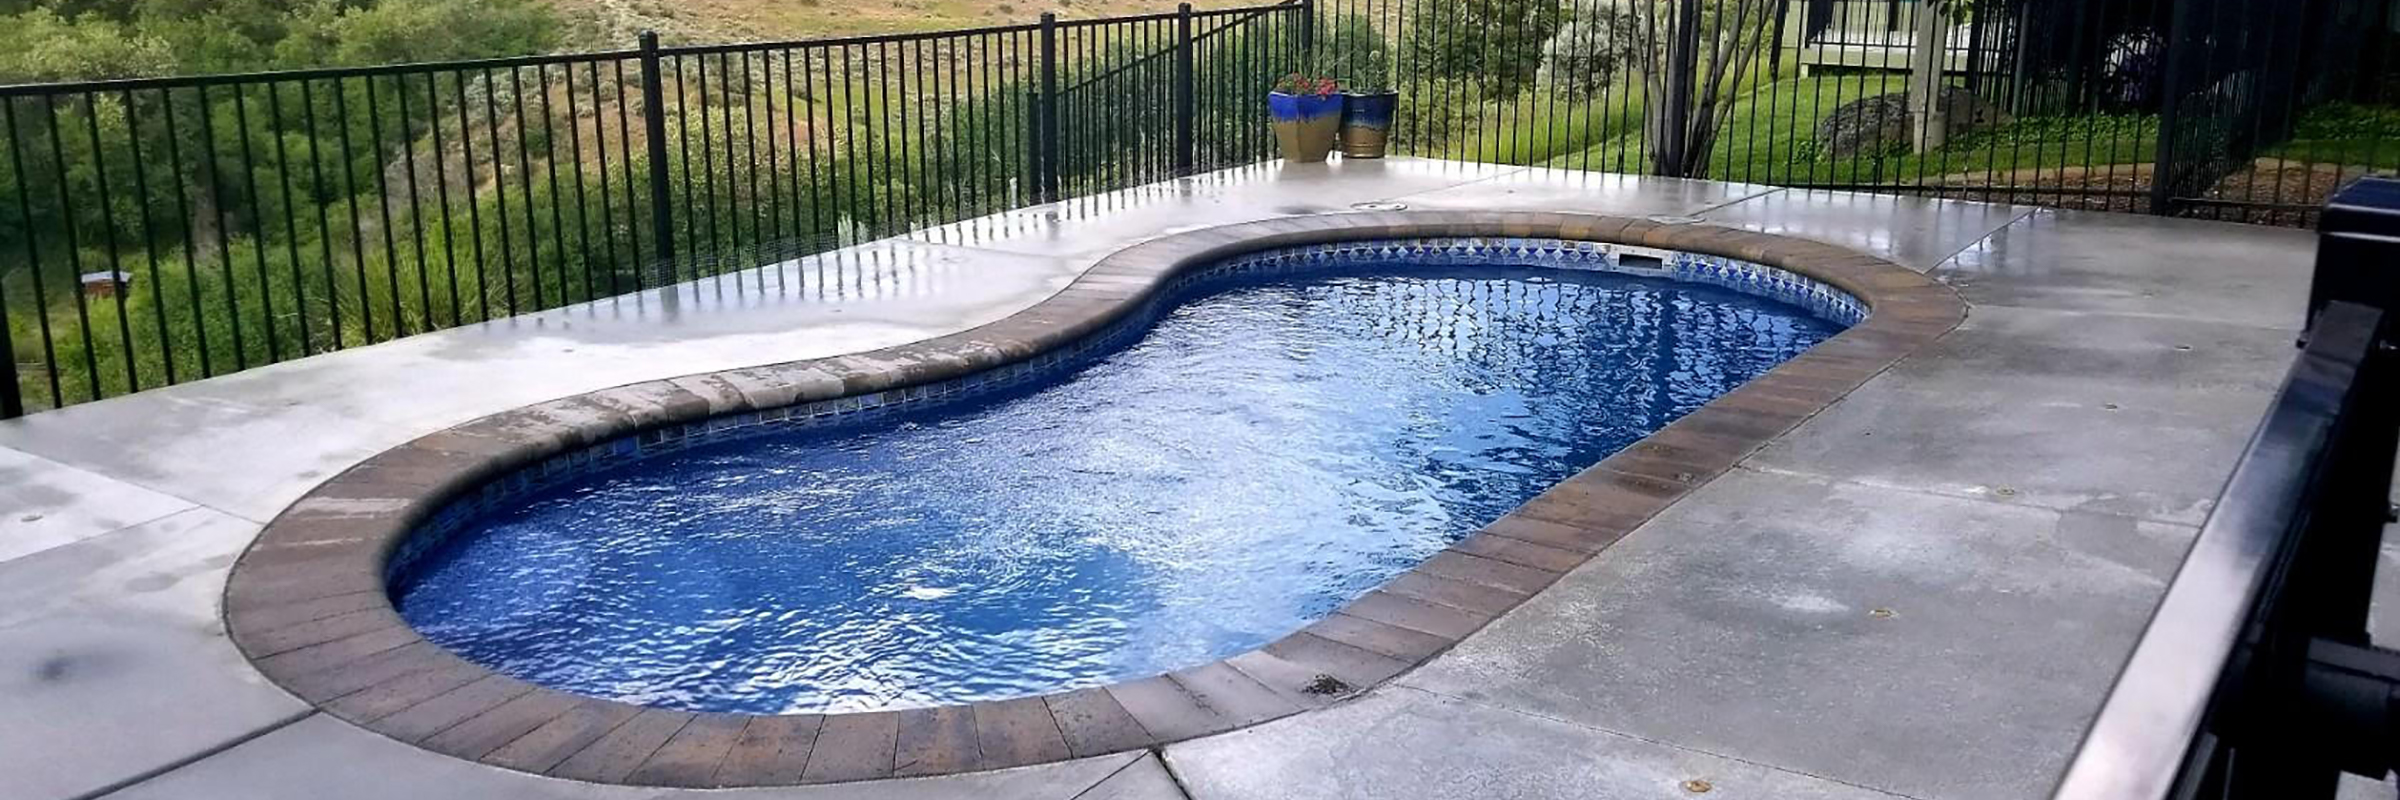 Boise pool builder idaho pool maintenance in boise meridian eagle pioneer pool and spa for Swimming pool contractors boise idaho